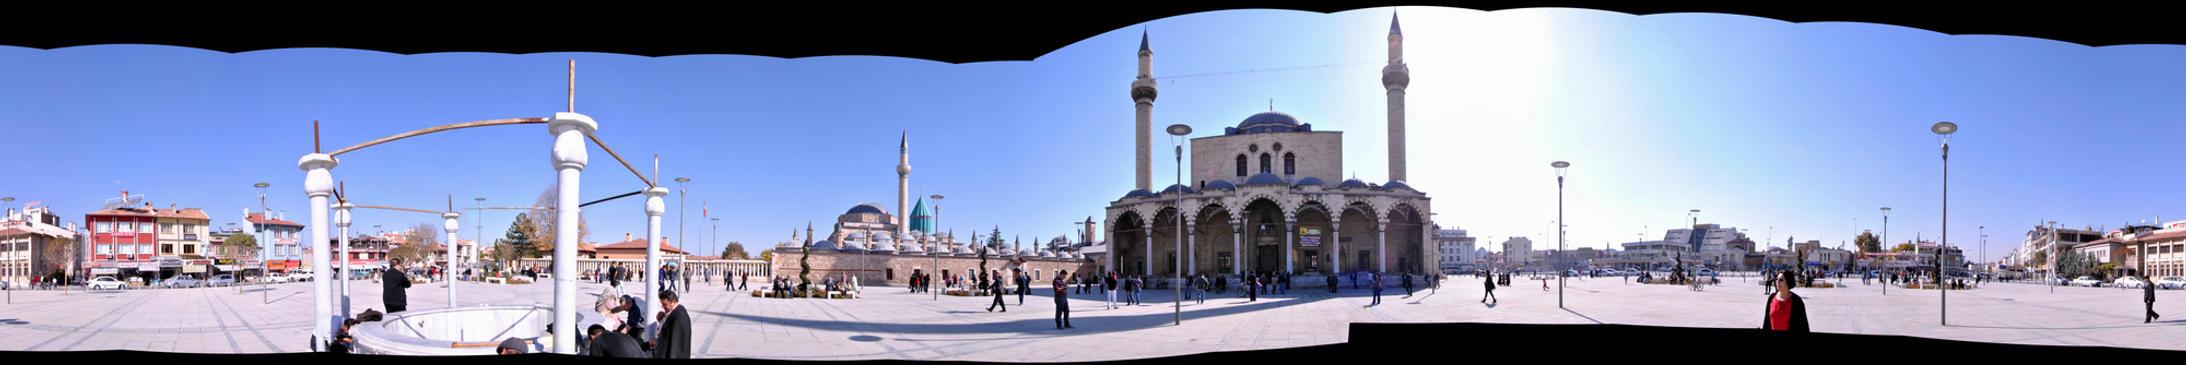 Konya Mevlana Turbesi ve Selimiye Camii by AkKrock